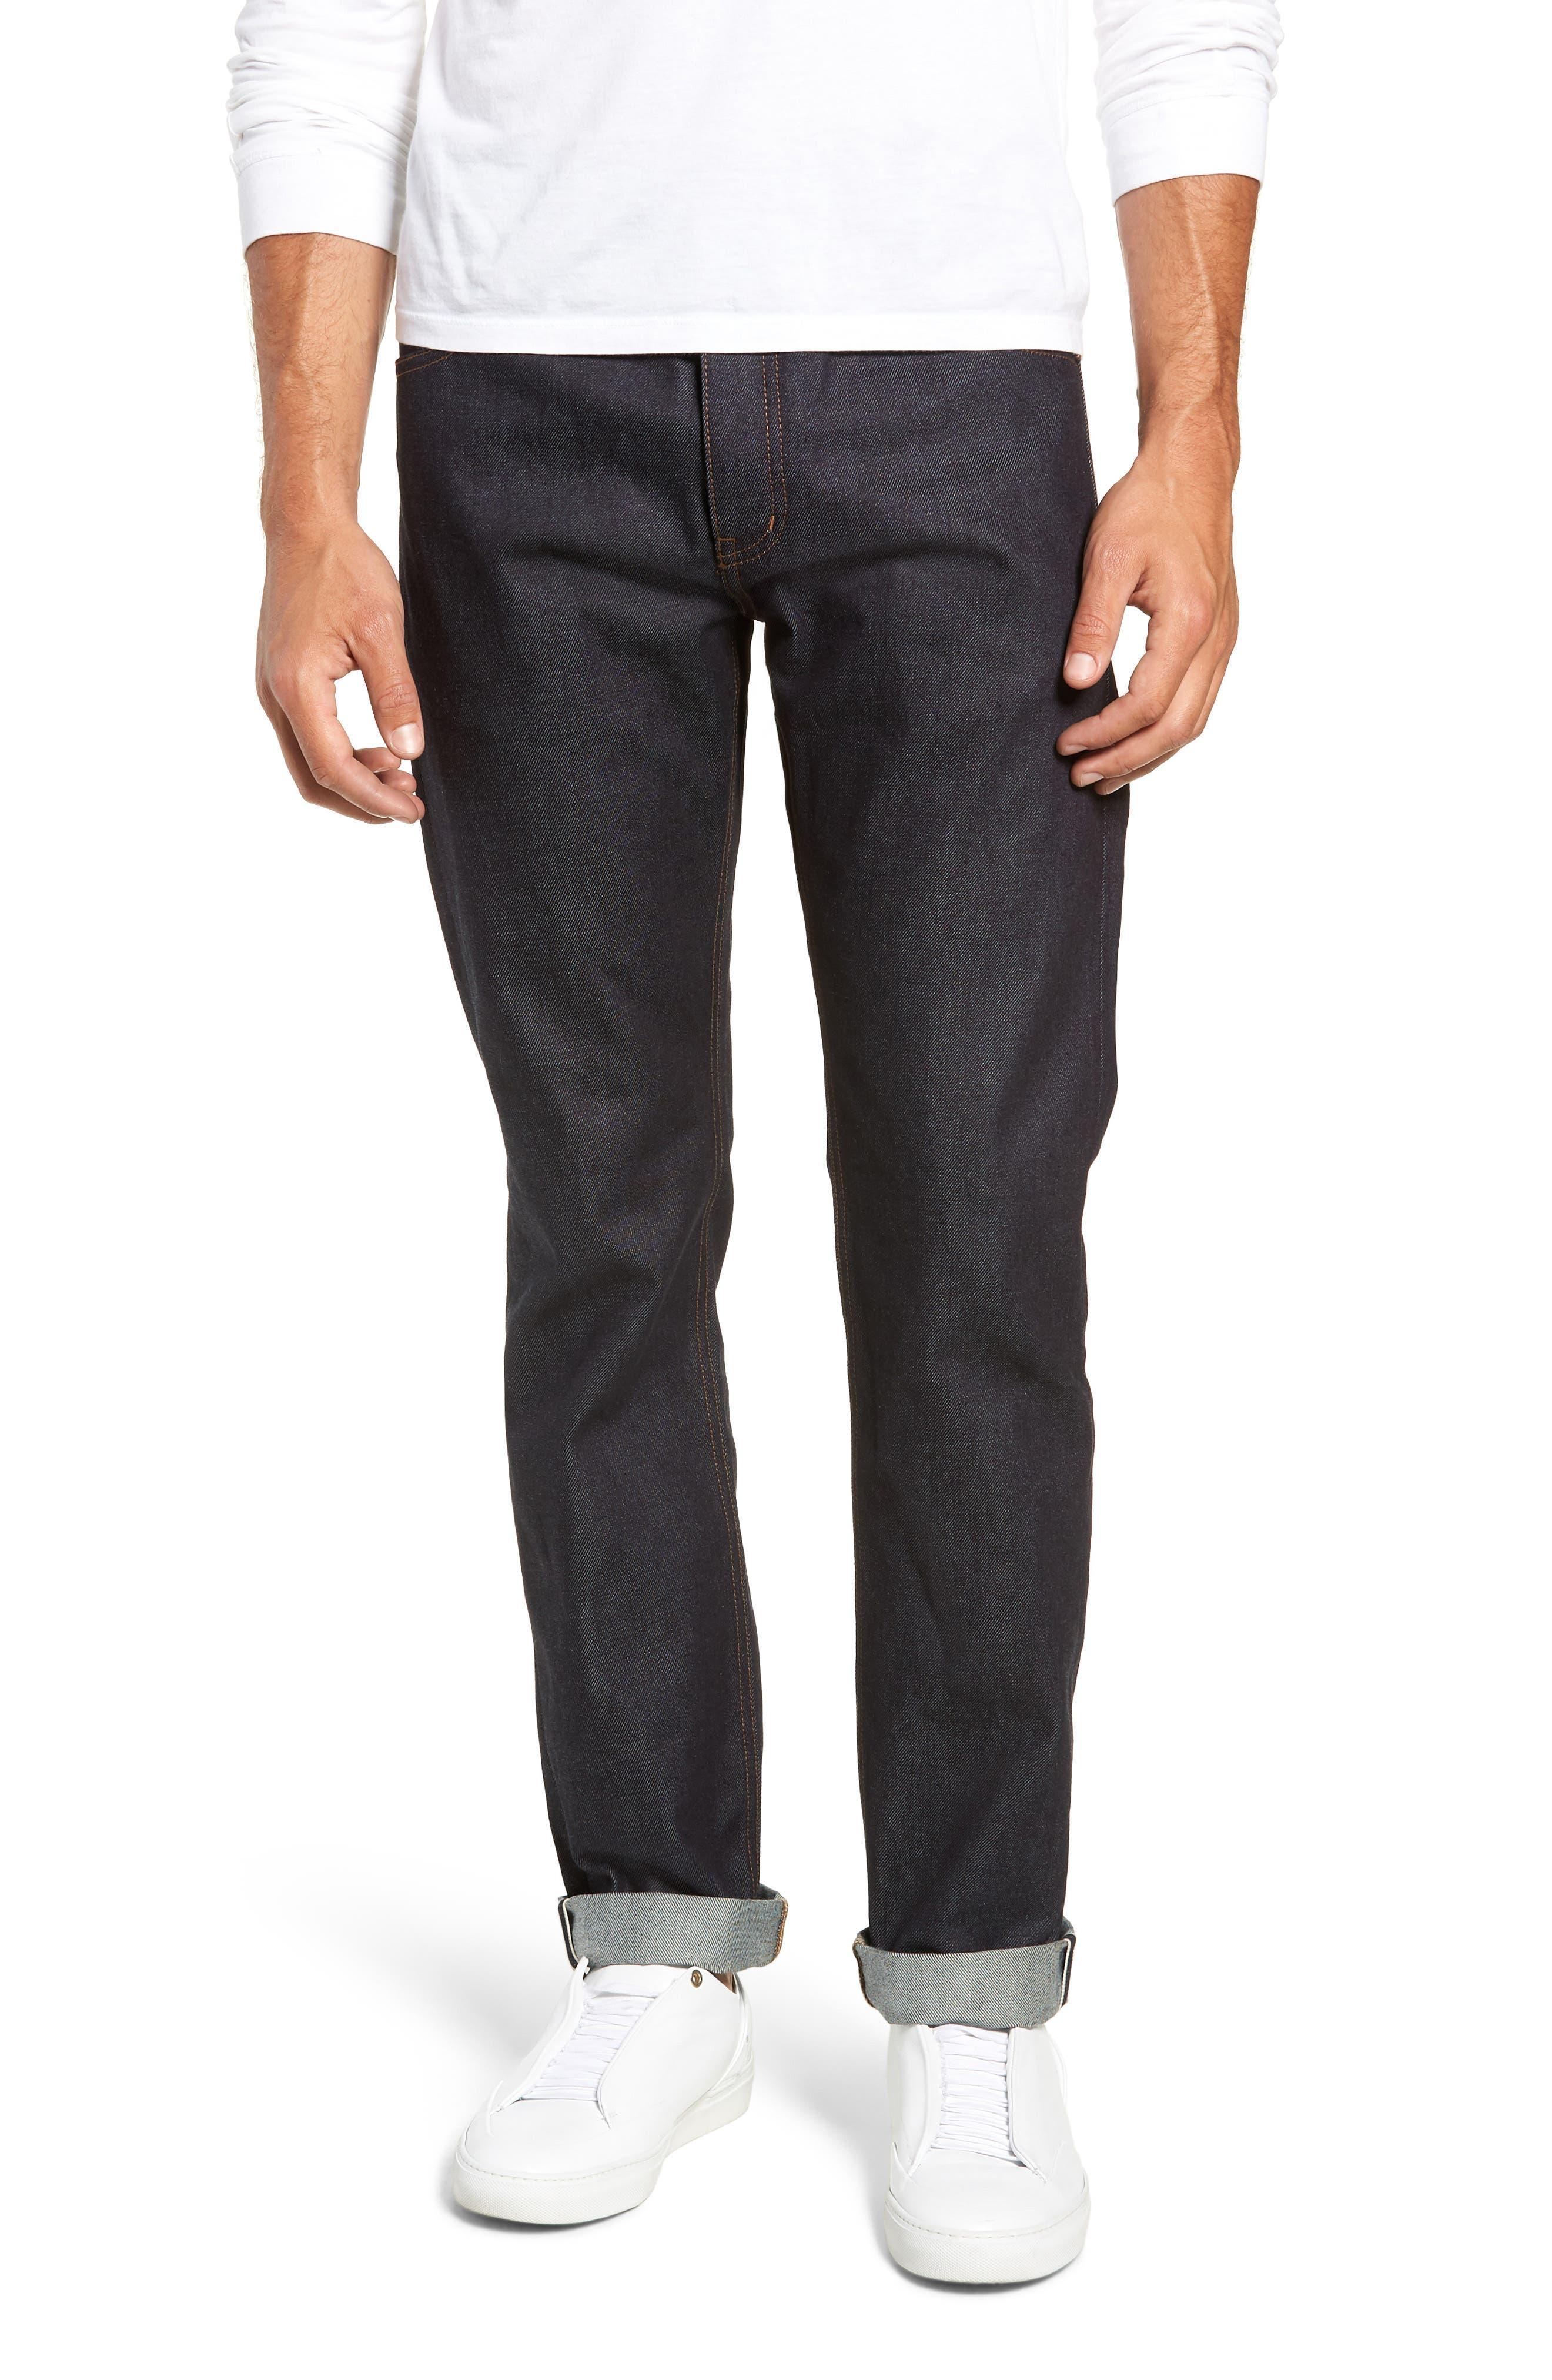 Dr. Denim Jeansmaker Gus Slim Straight Leg Raw Selvedge Jeans,                             Main thumbnail 1, color,                             RAW SELVAGE